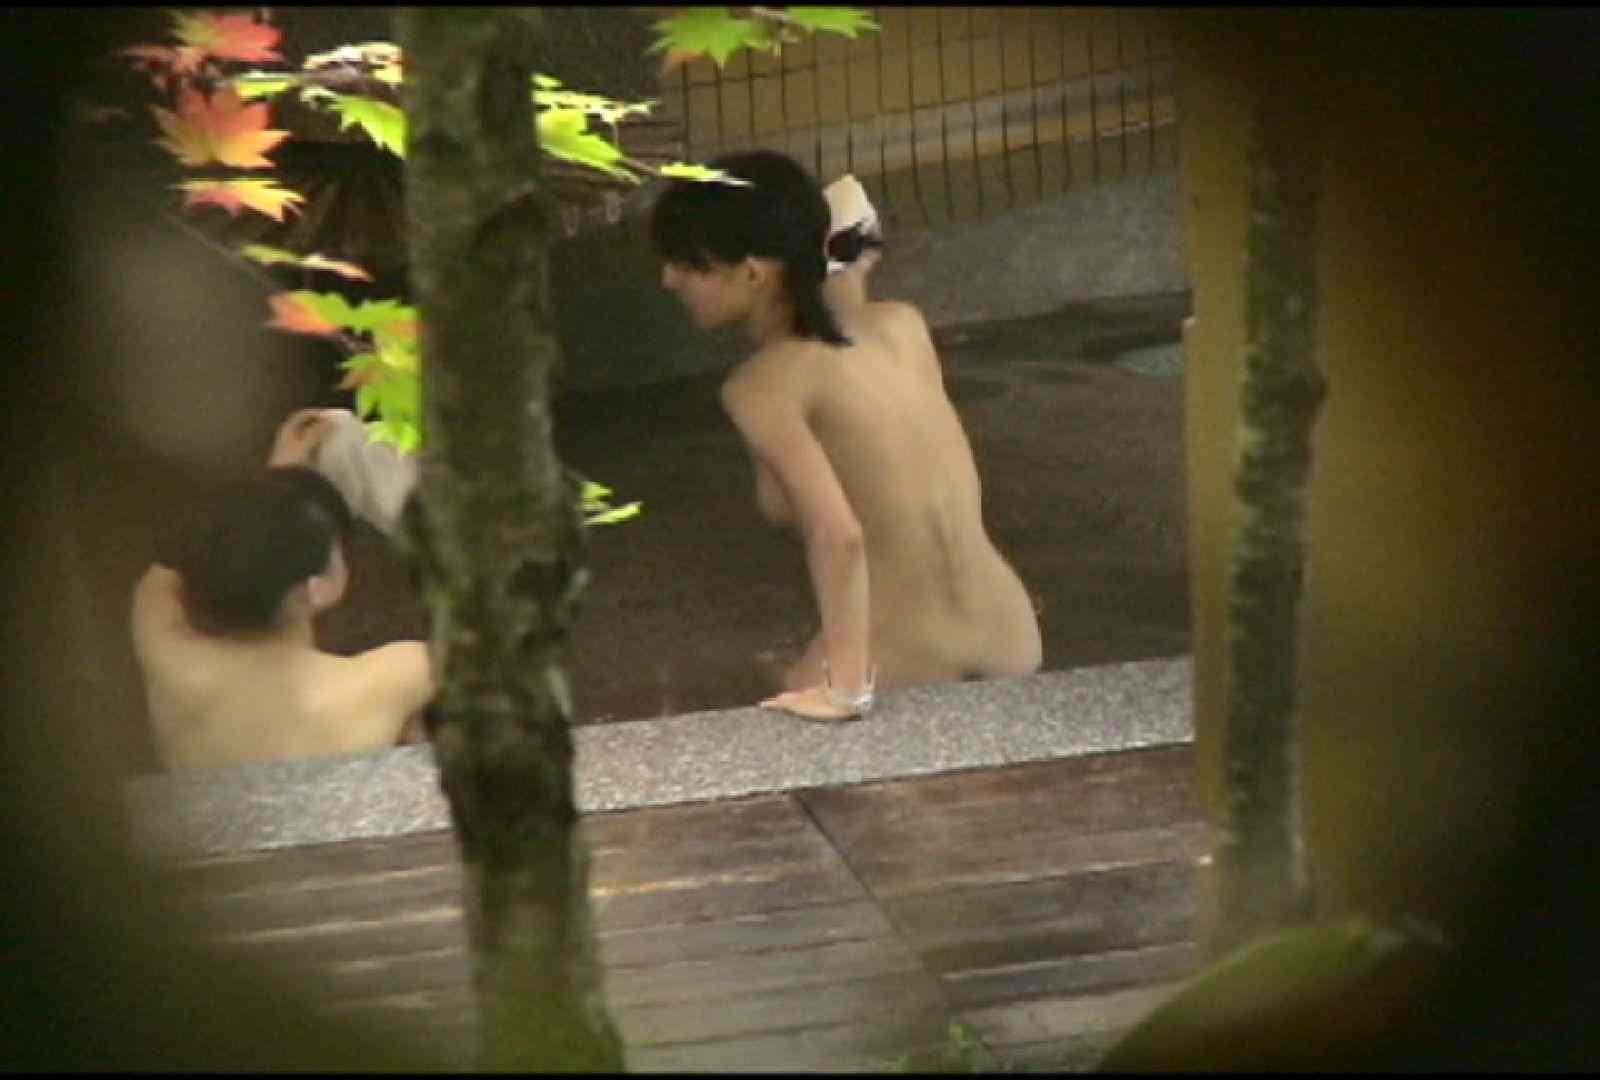 No.2 地味な2人、共に理想的な胸ですよ・・・しかし地味だ 美女達のヌード | 露天風呂の女達  67連発 2